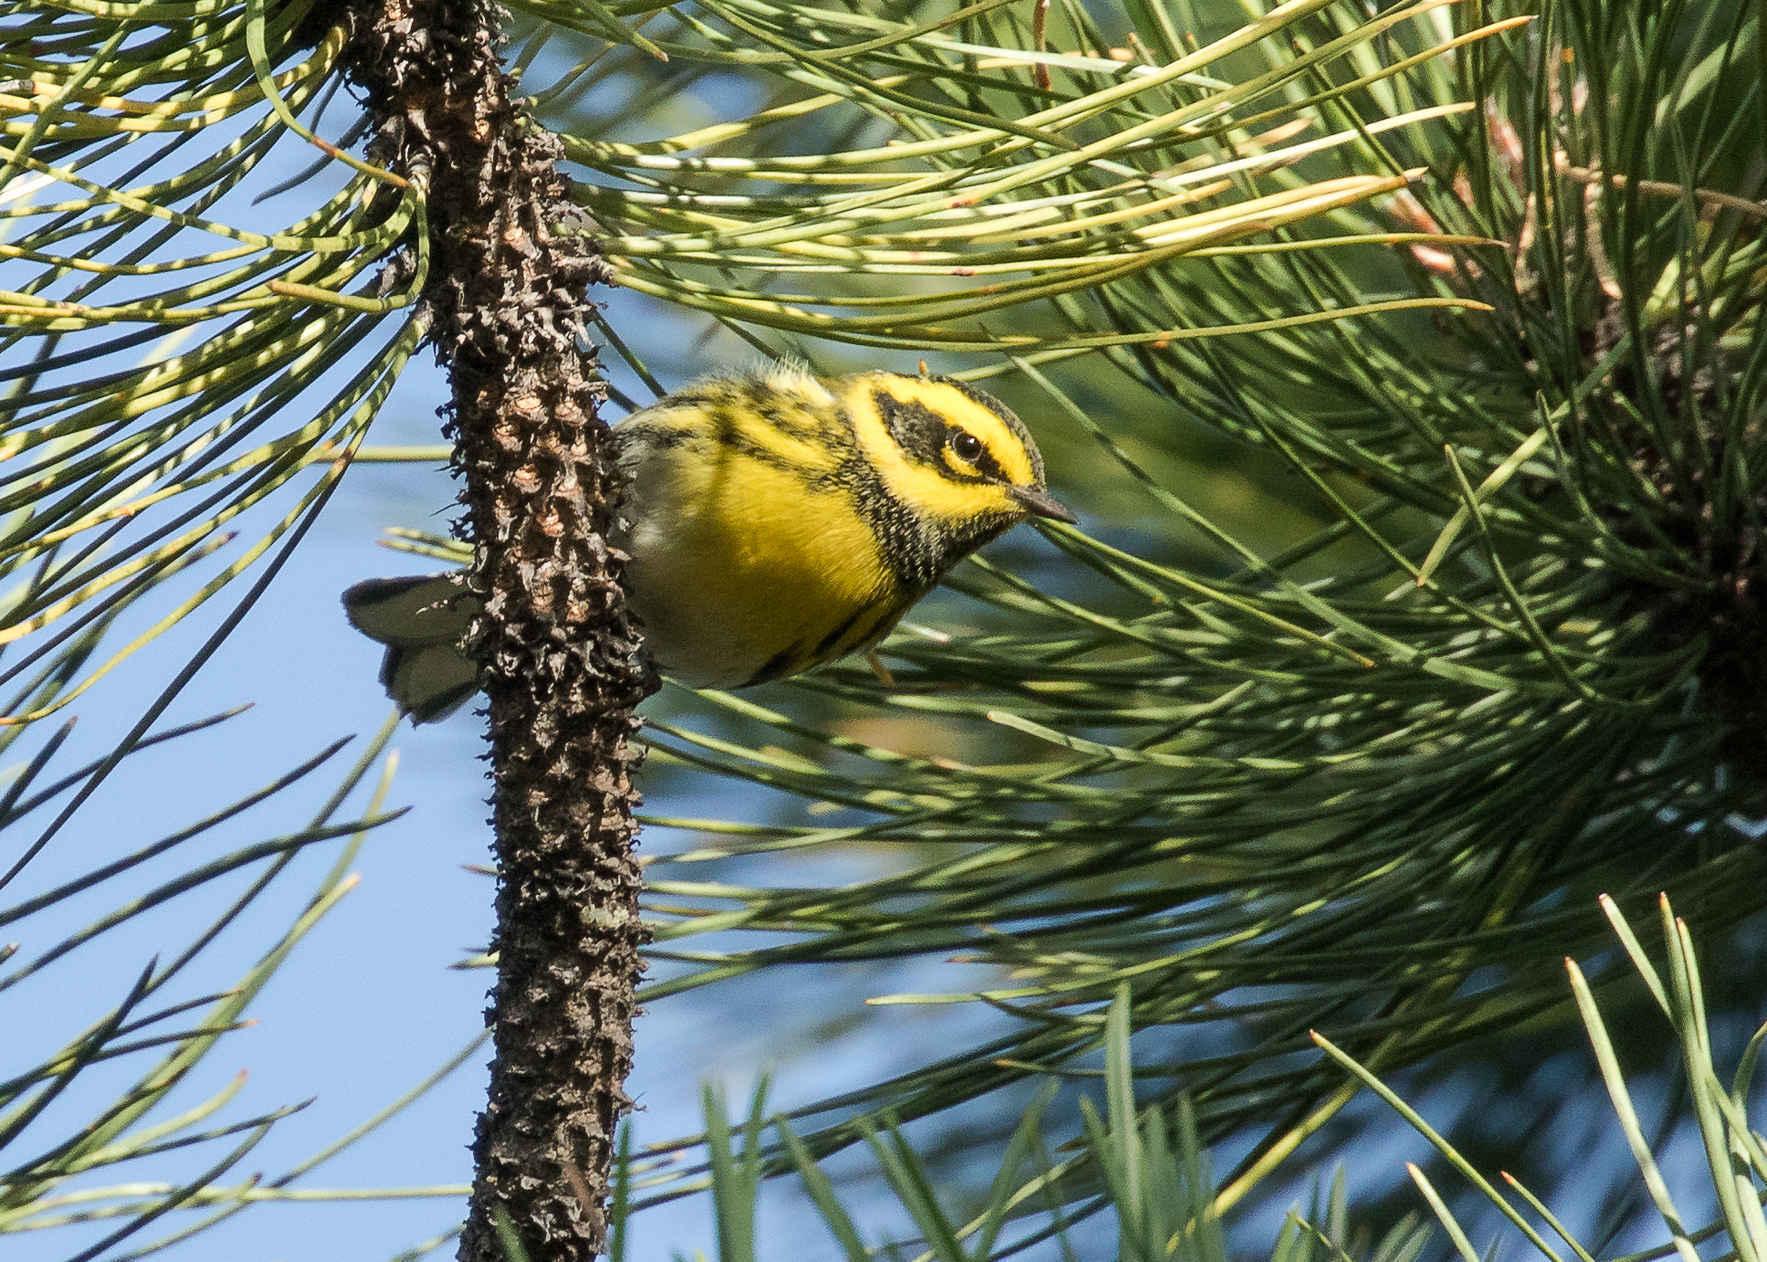 Birding 101 image